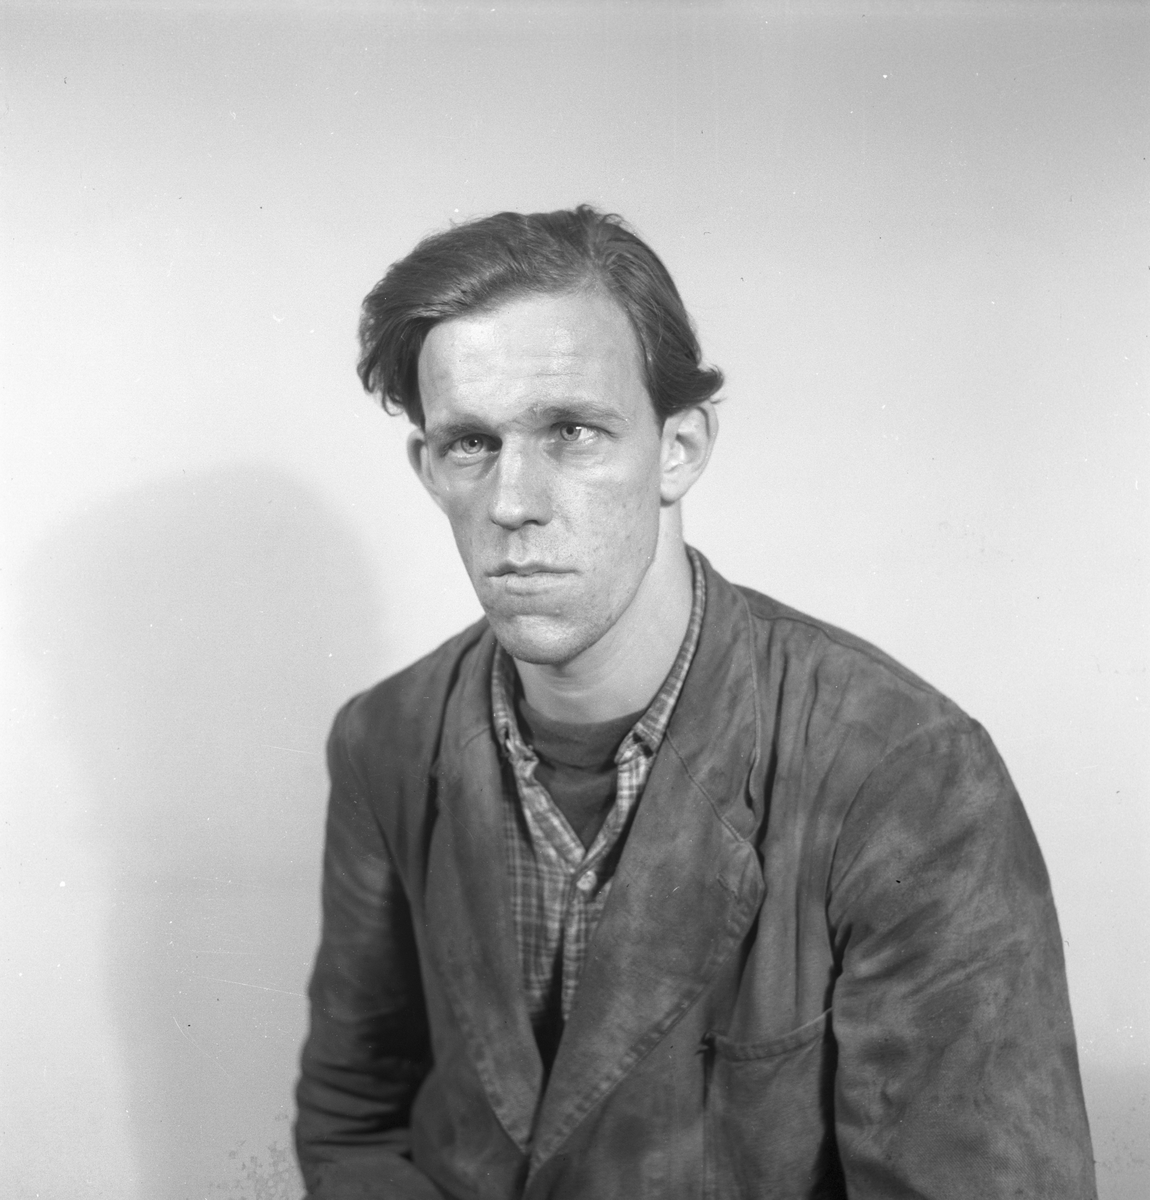 Gävle Dala Järnväg. 1946.